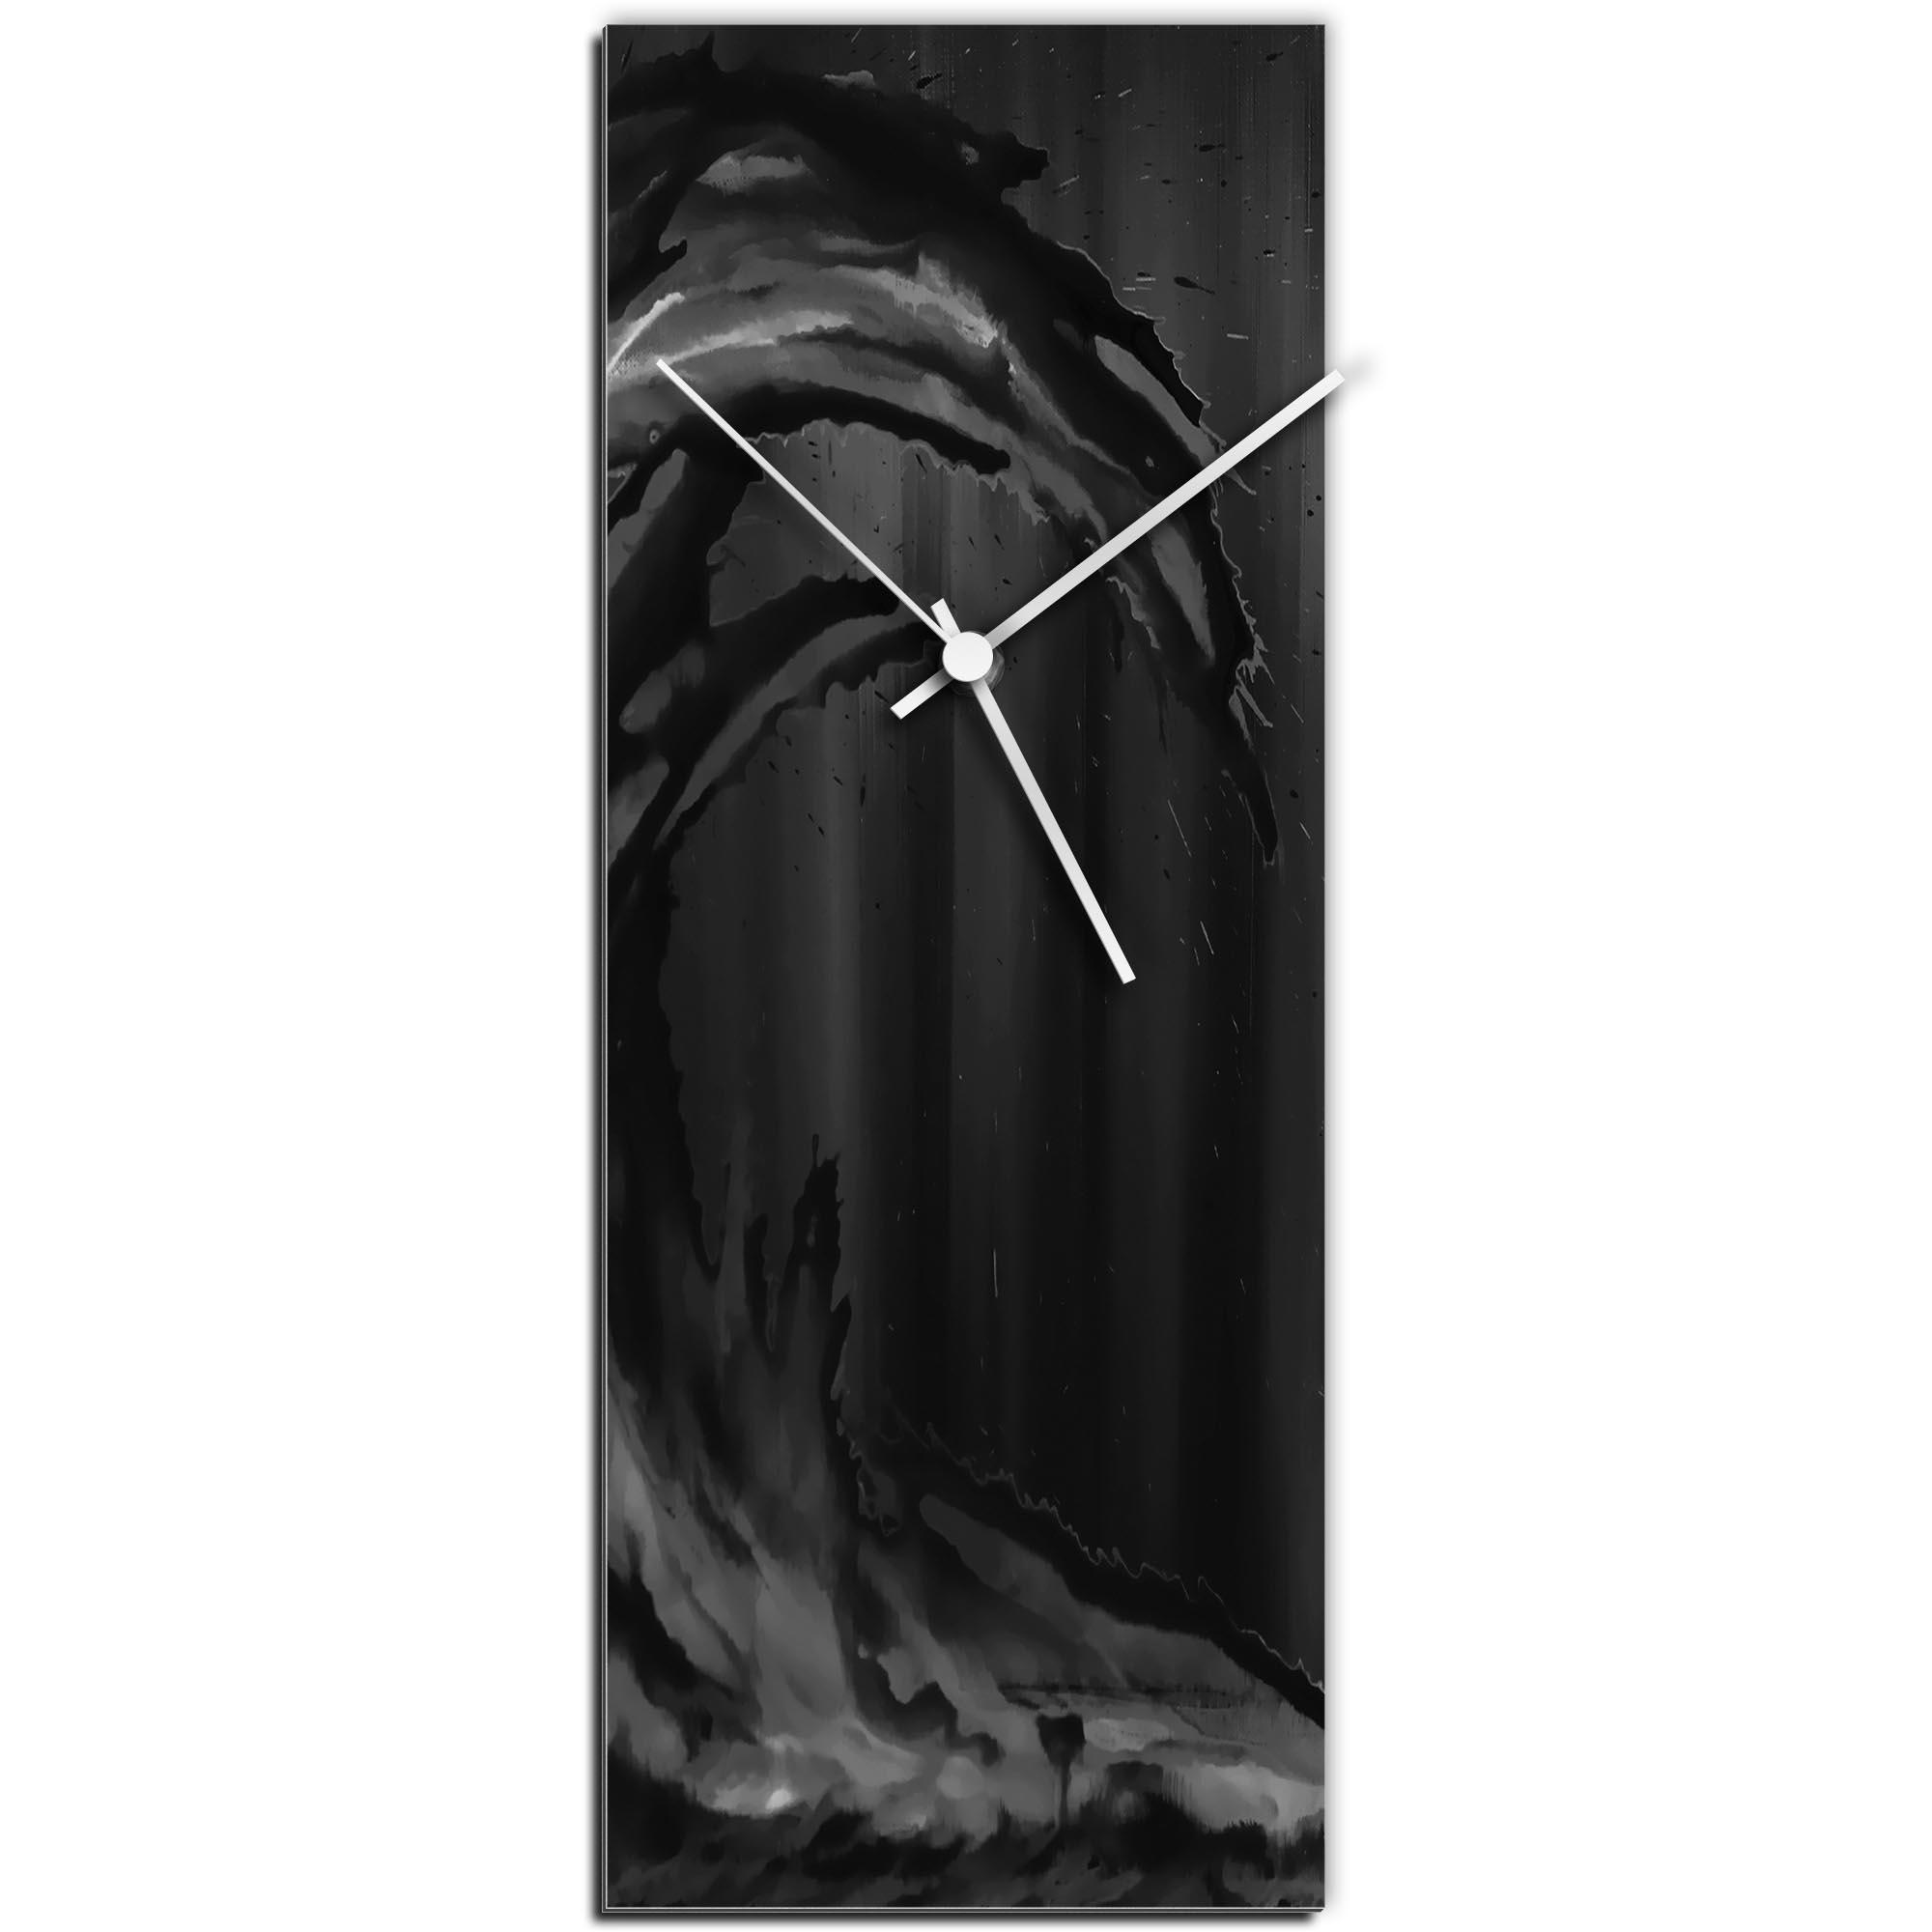 Mendo Vasilevski 'Black Wave v1 Clock' 6in x 16in Modern Wall Clock on Aluminum Composite